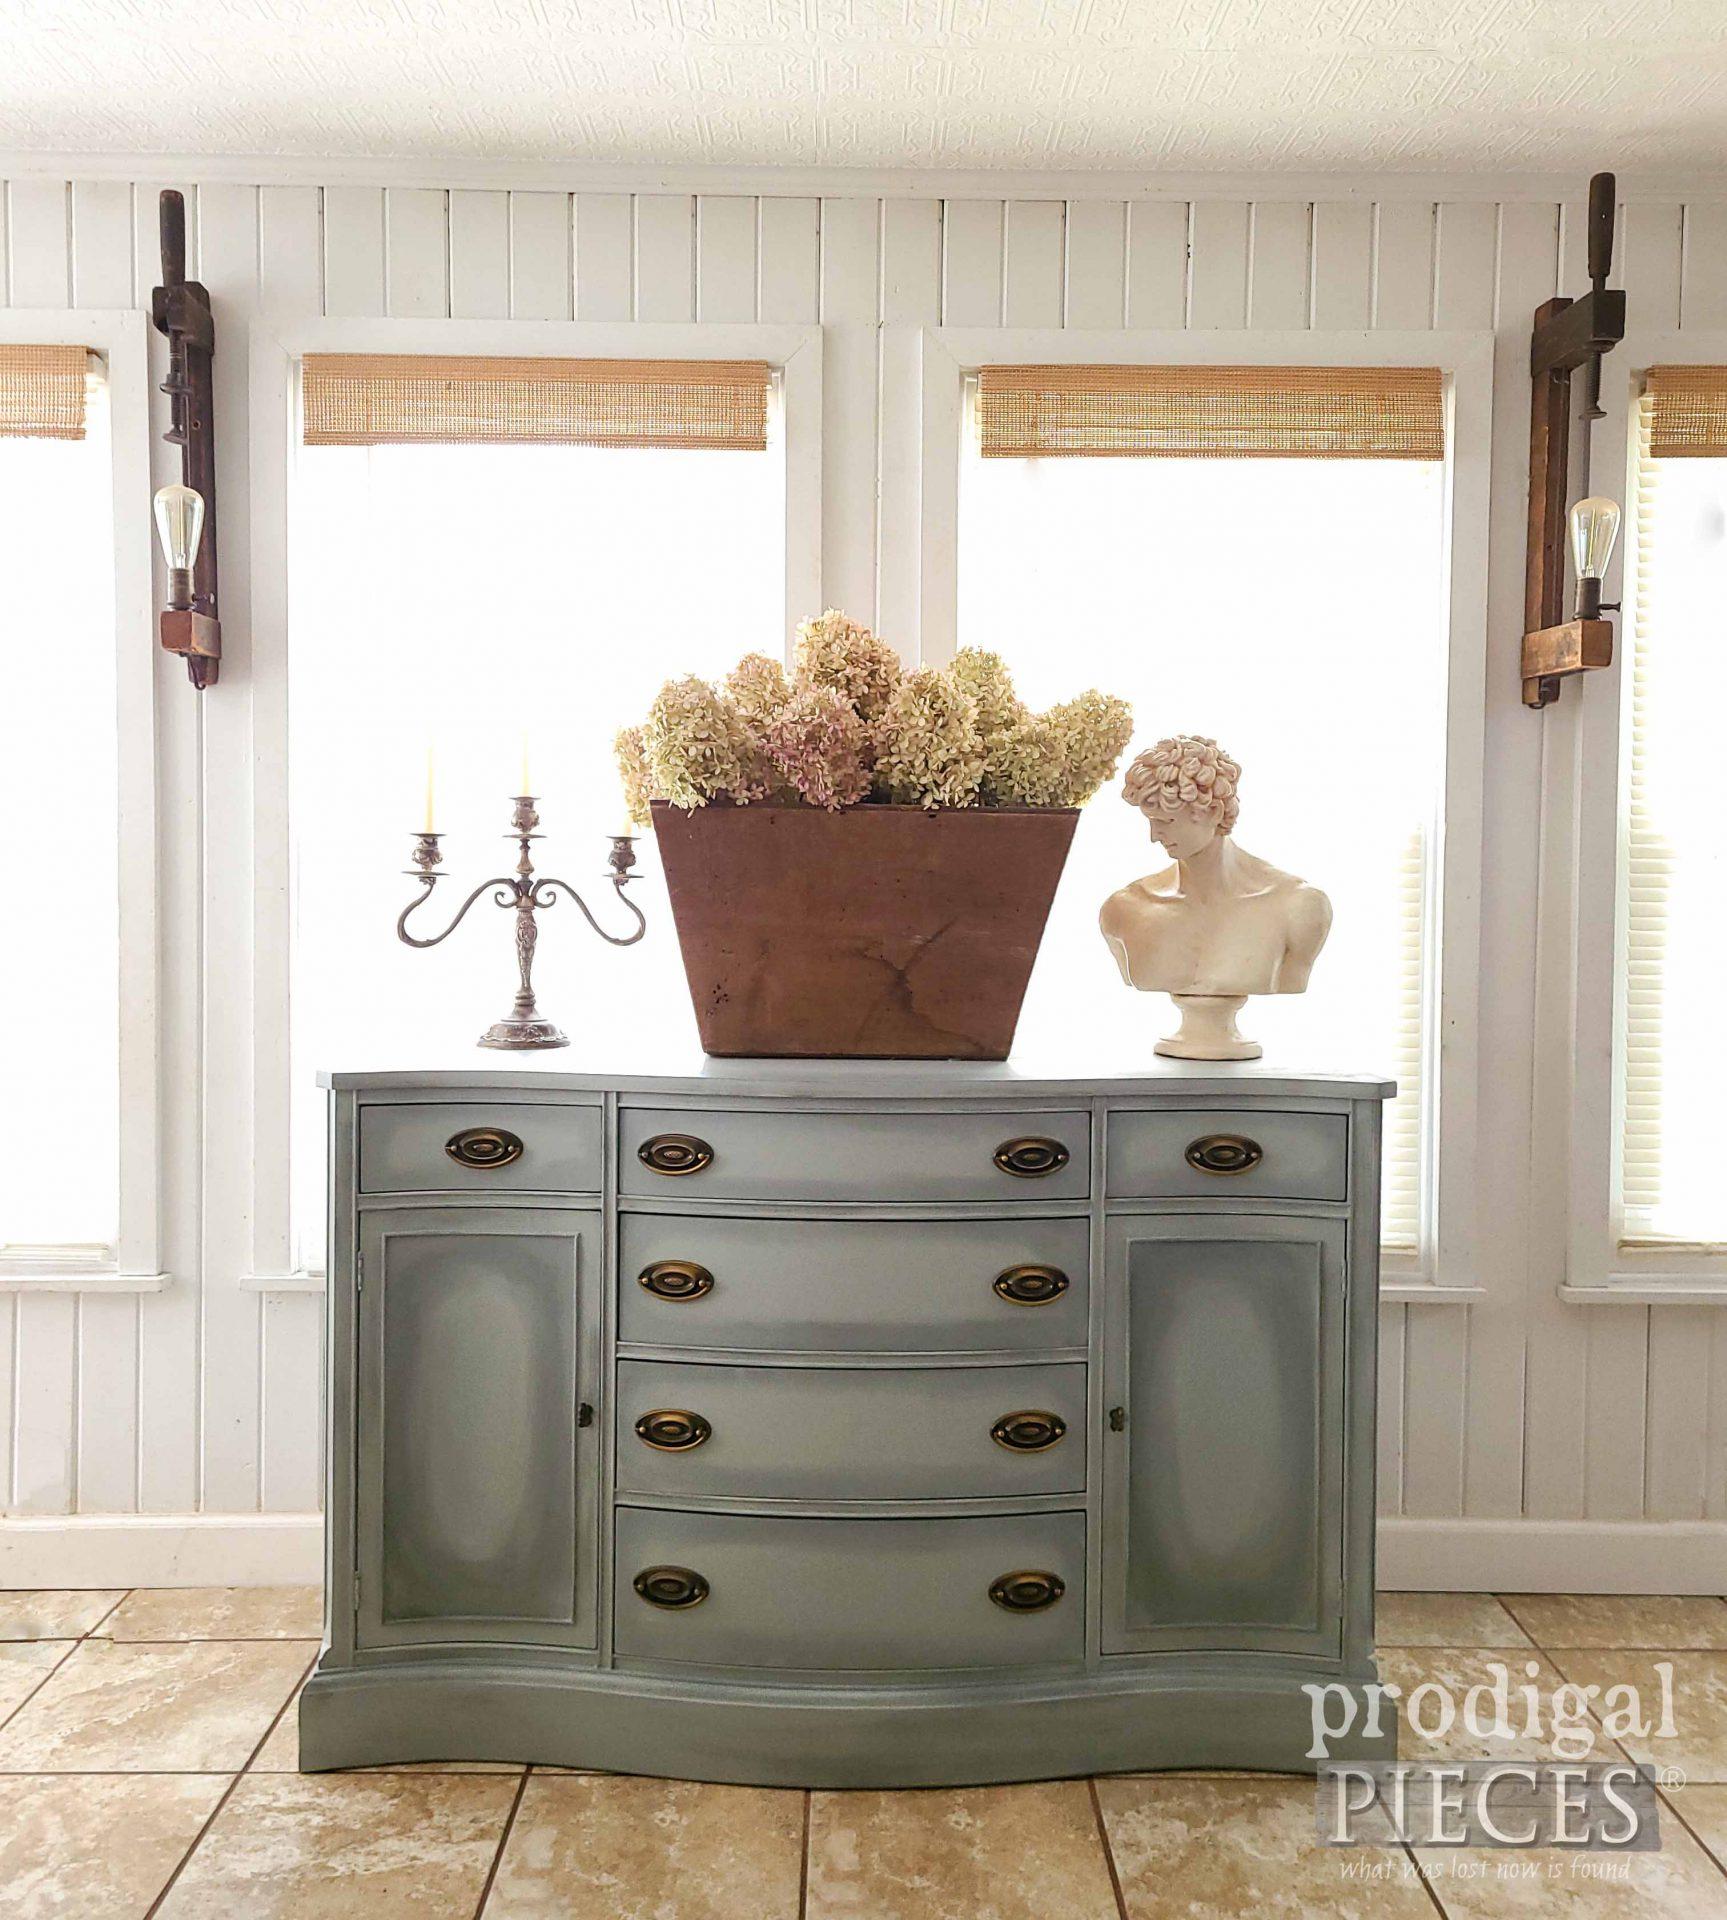 Green Blue Bassett Buffet Makeover by Larissa of Prodigal Pieces | prodigalpieces.com #prodigalpieces #furniture #vintage #diy #home #homedecor